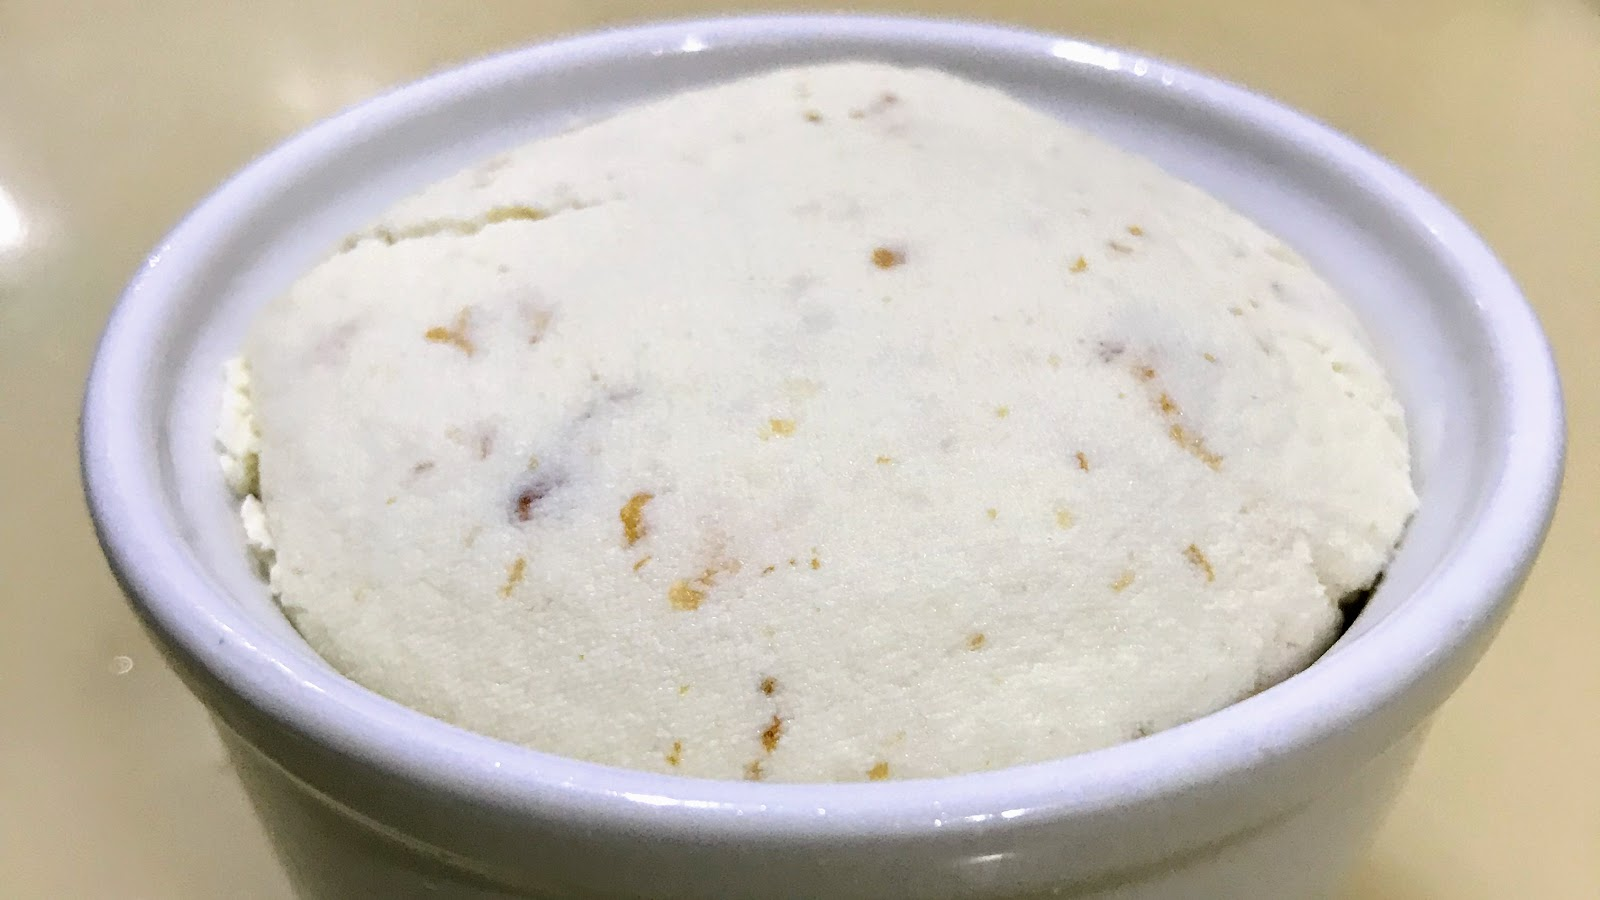 IMG_3403.HEIC-自製起司乾酪